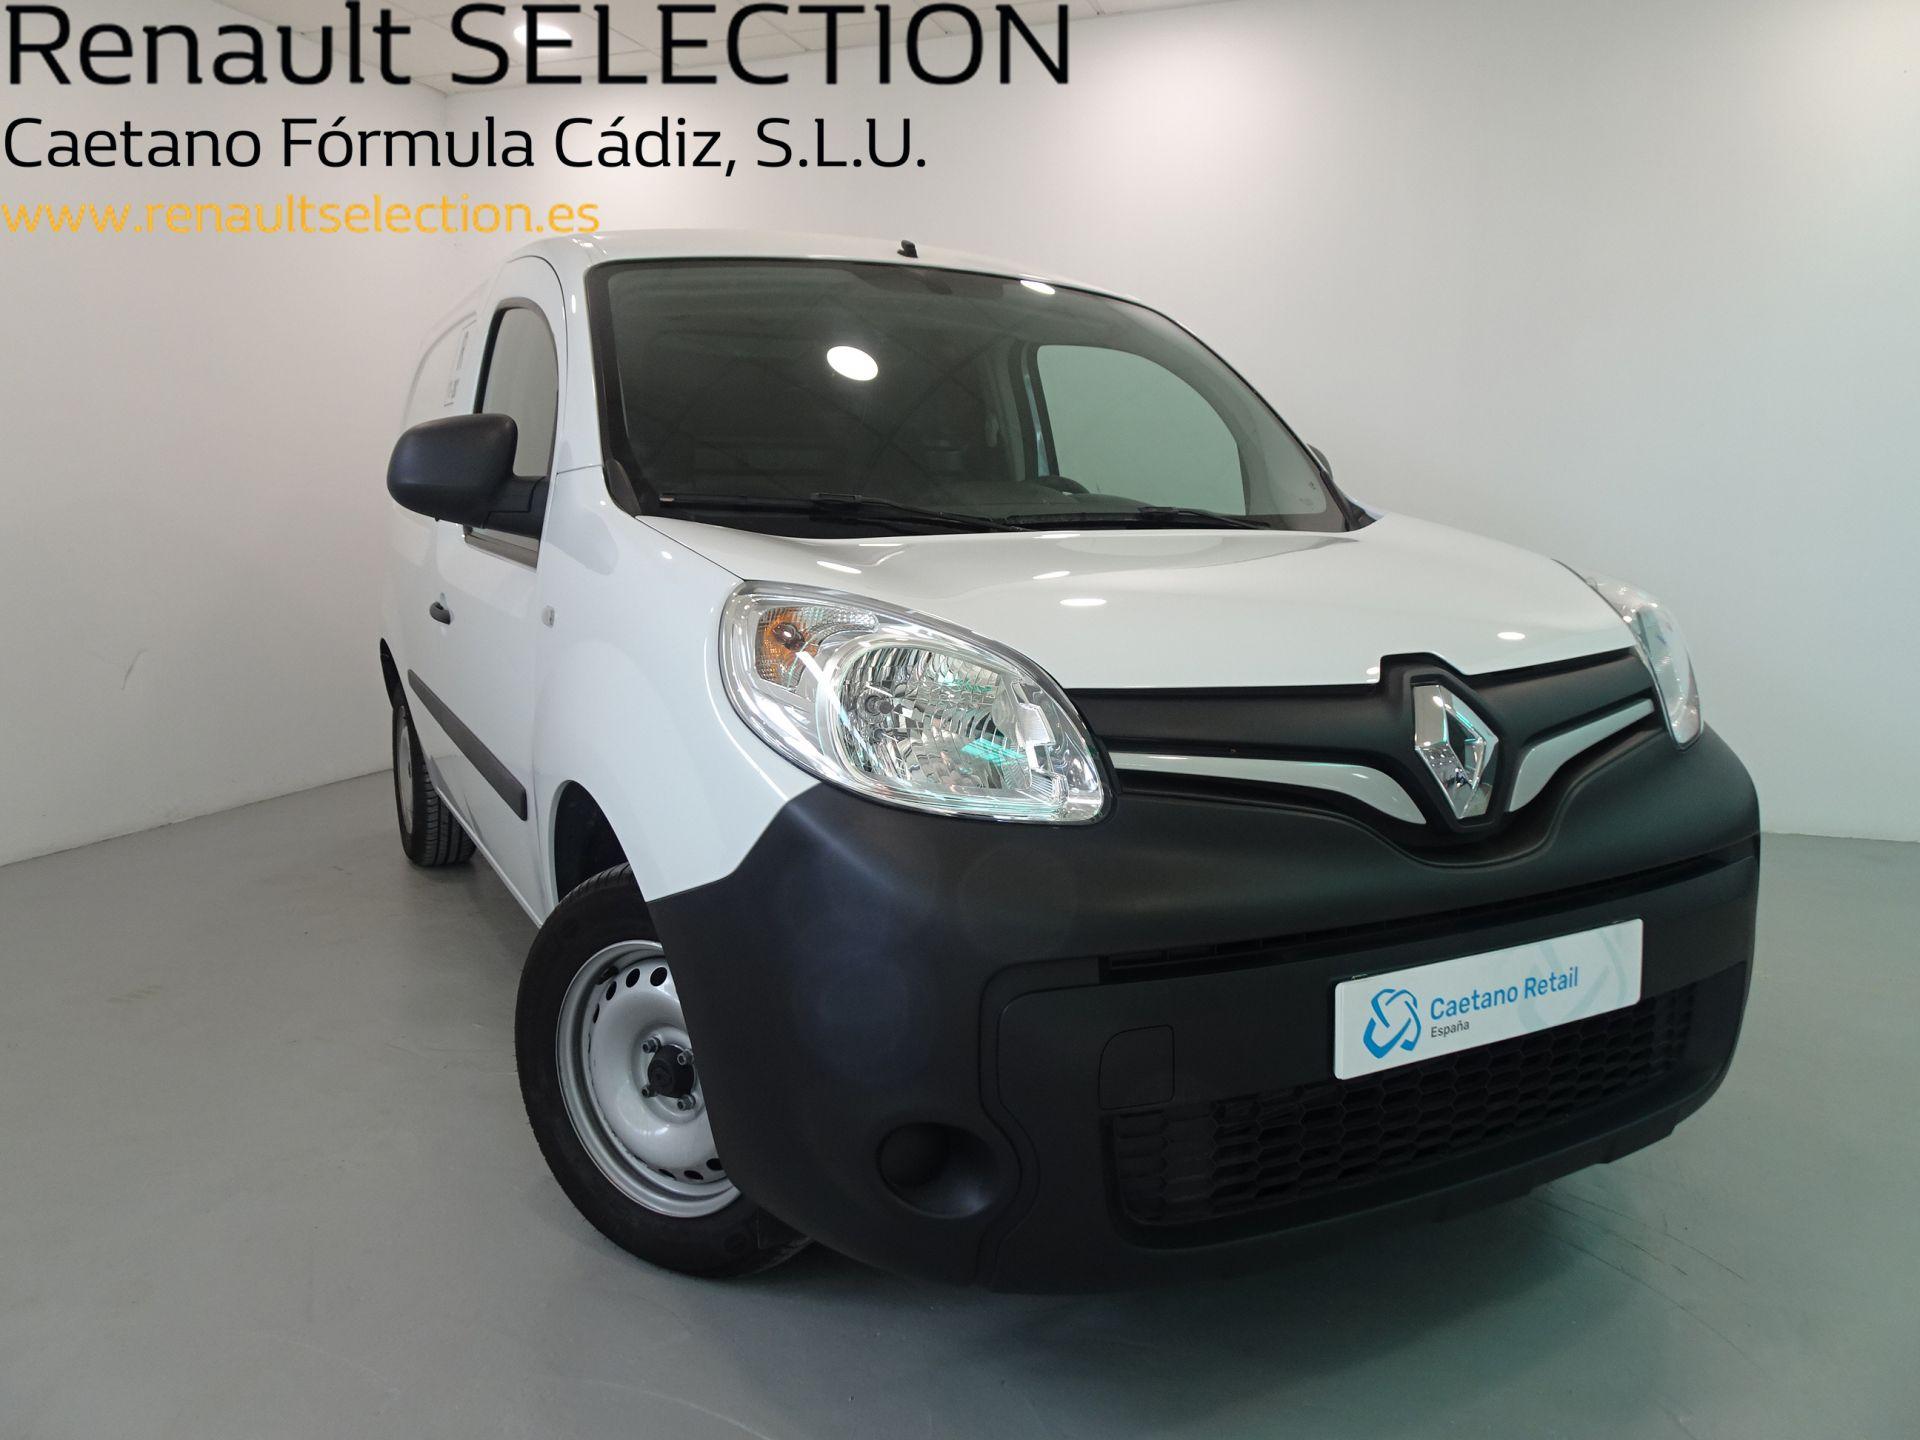 Renault Kangoo Furgón Profesional dCi 55 kW (75 CV) segunda mano Cádiz